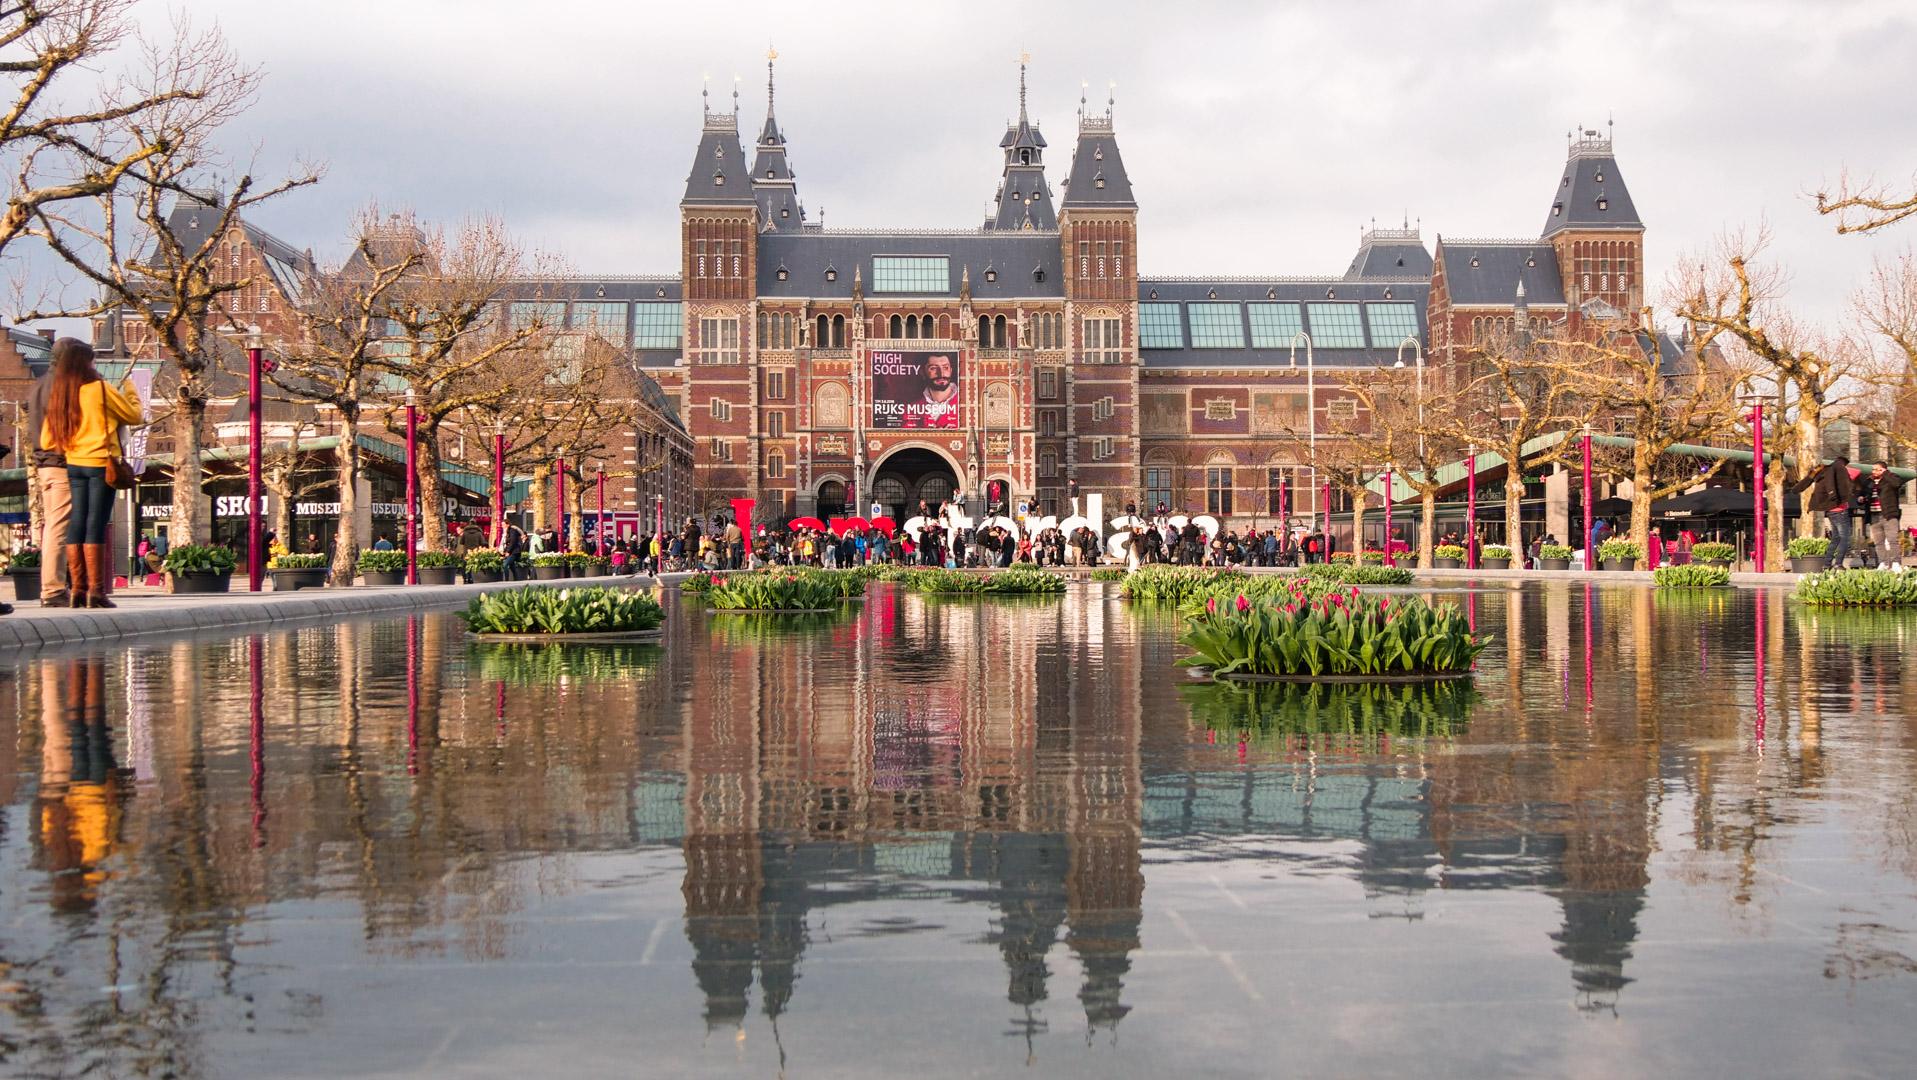 DianoMaya_Amsterdam-1199344